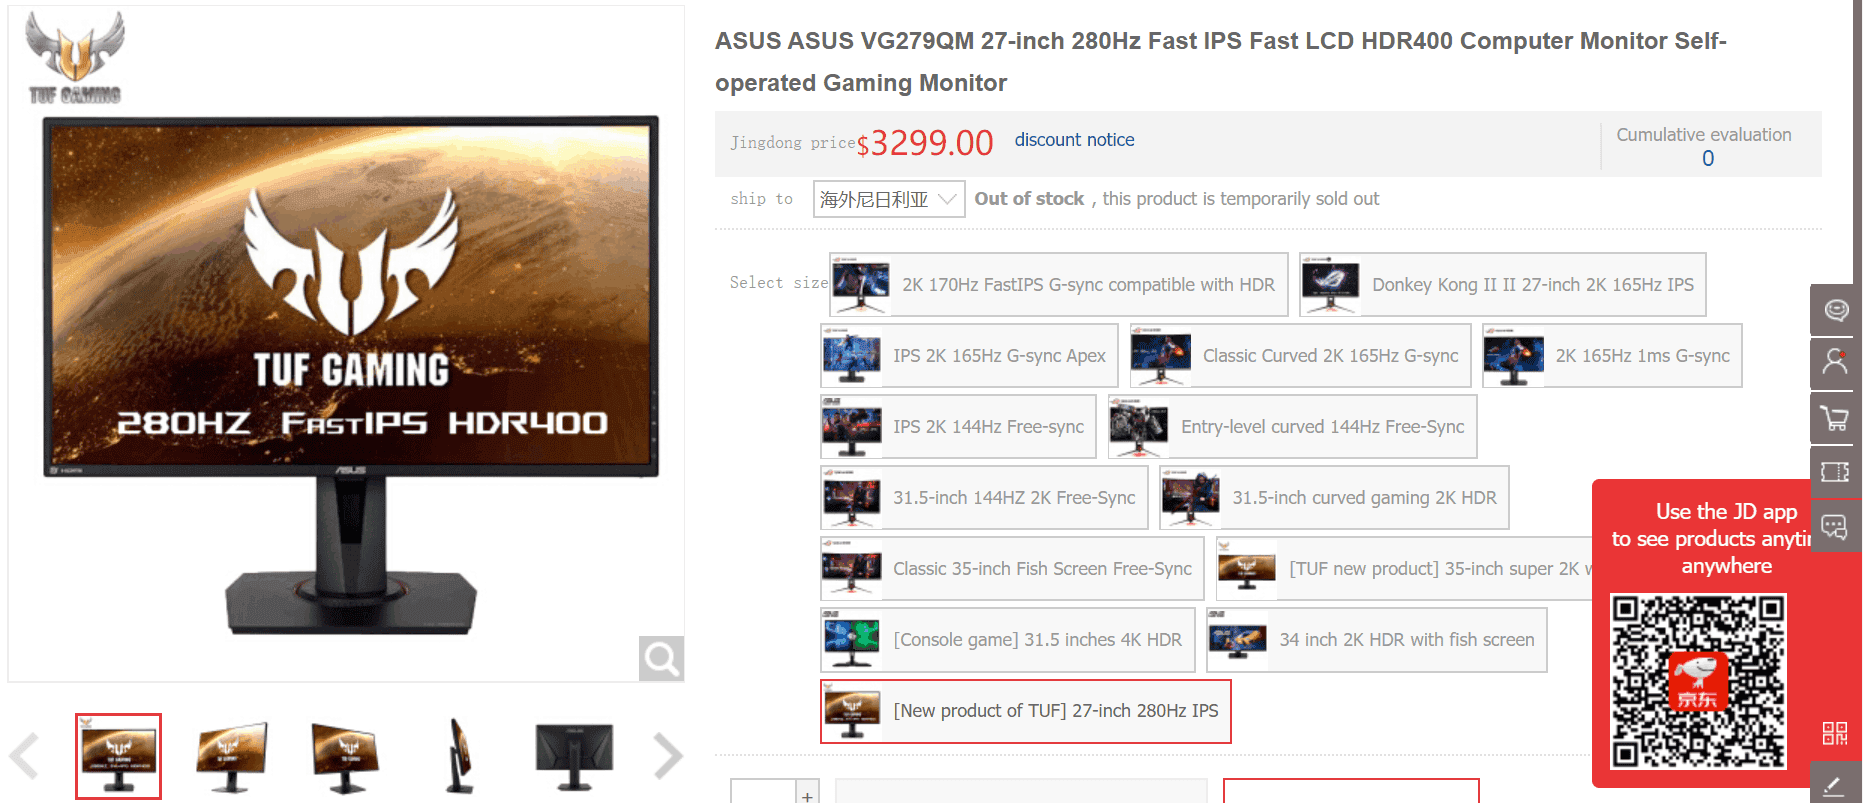 Asus IPS gaming monitor